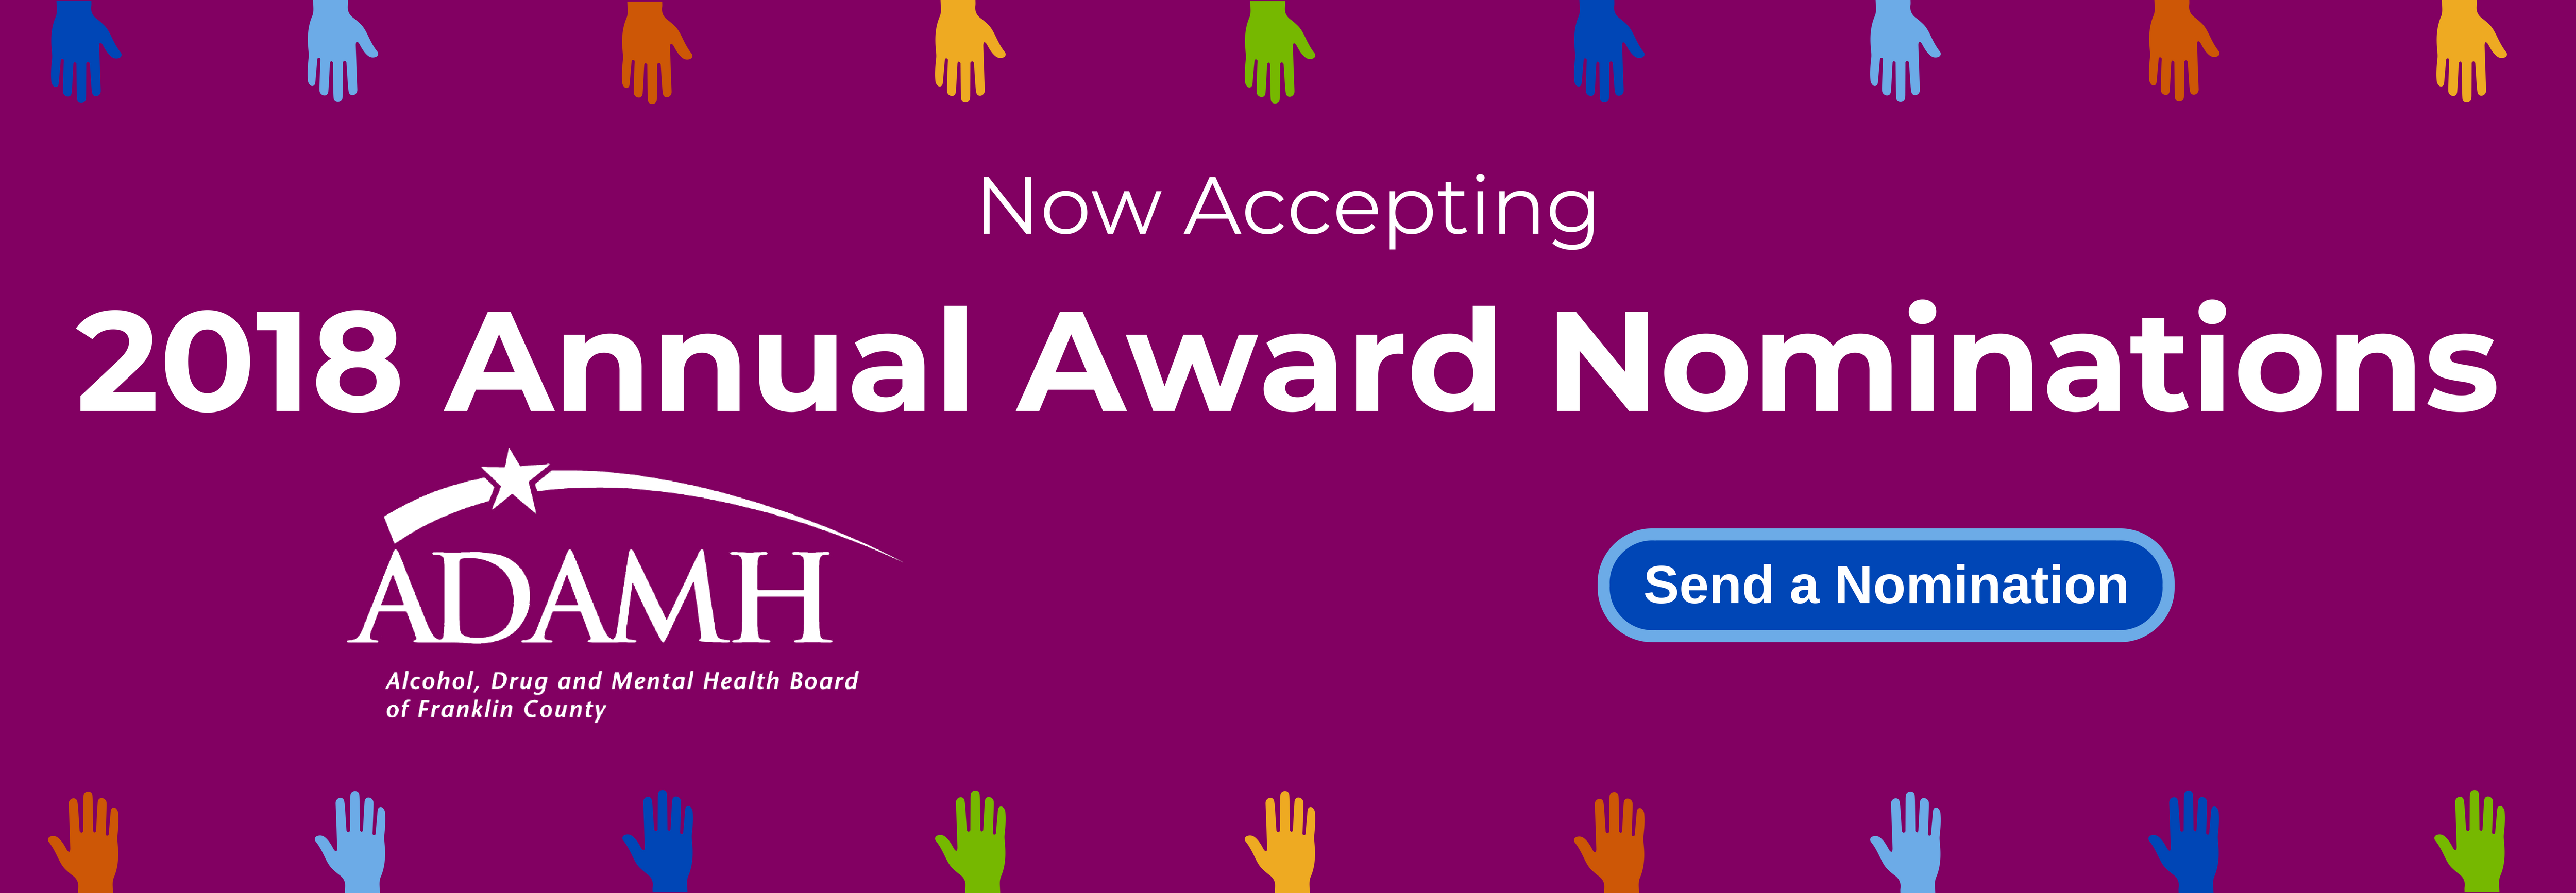 2018-Annual-AwardNominations